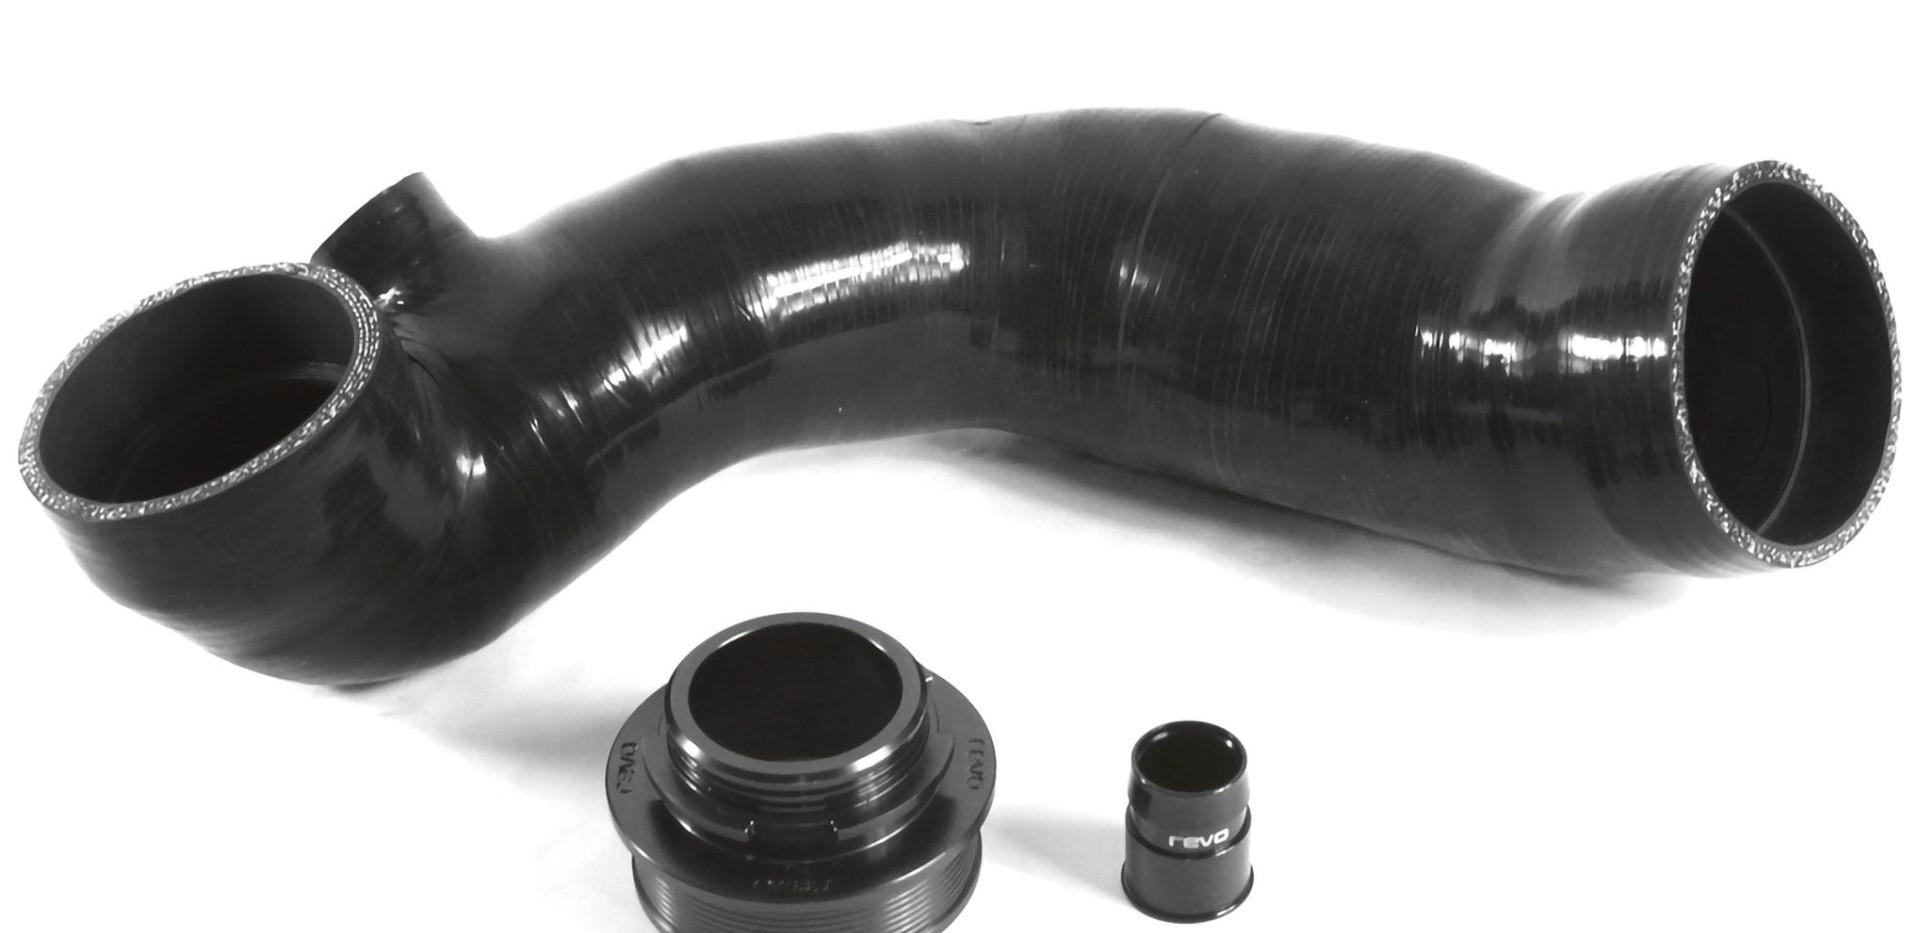 Revo Turbo Elbow Intake Pipe For VAG